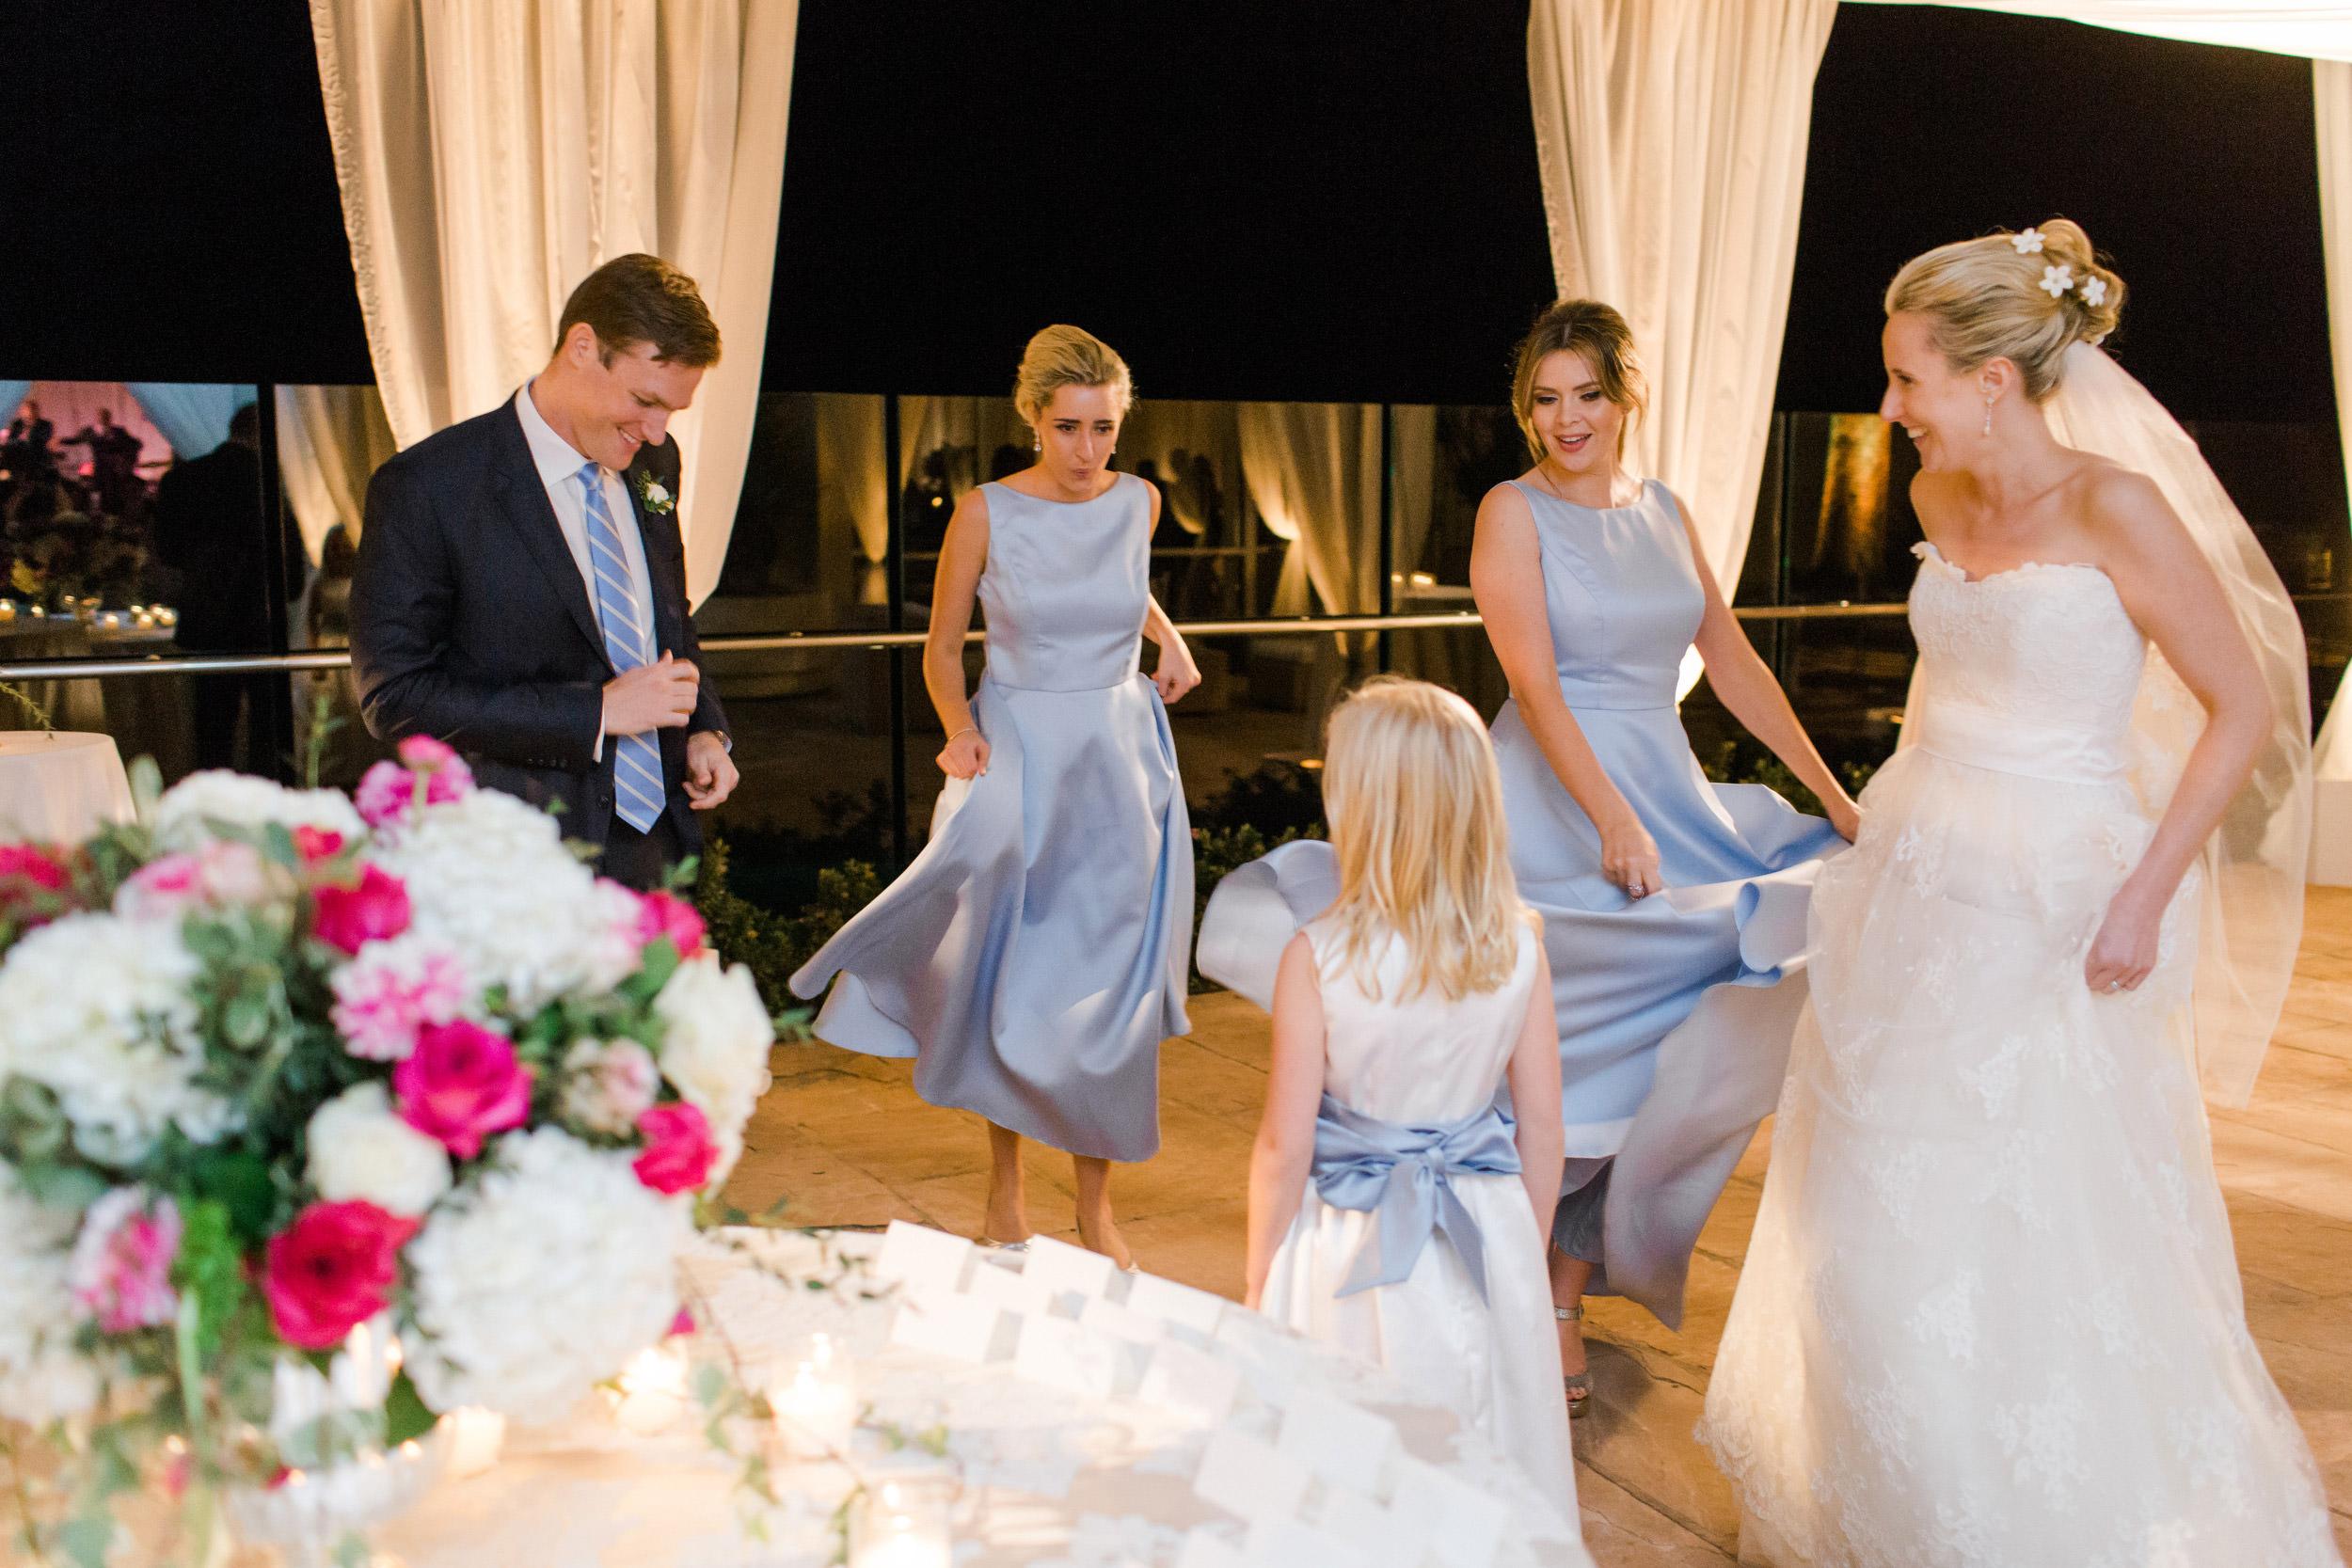 biltmore_santa_barbara_wedding_photos_coral_casino_055.jpg